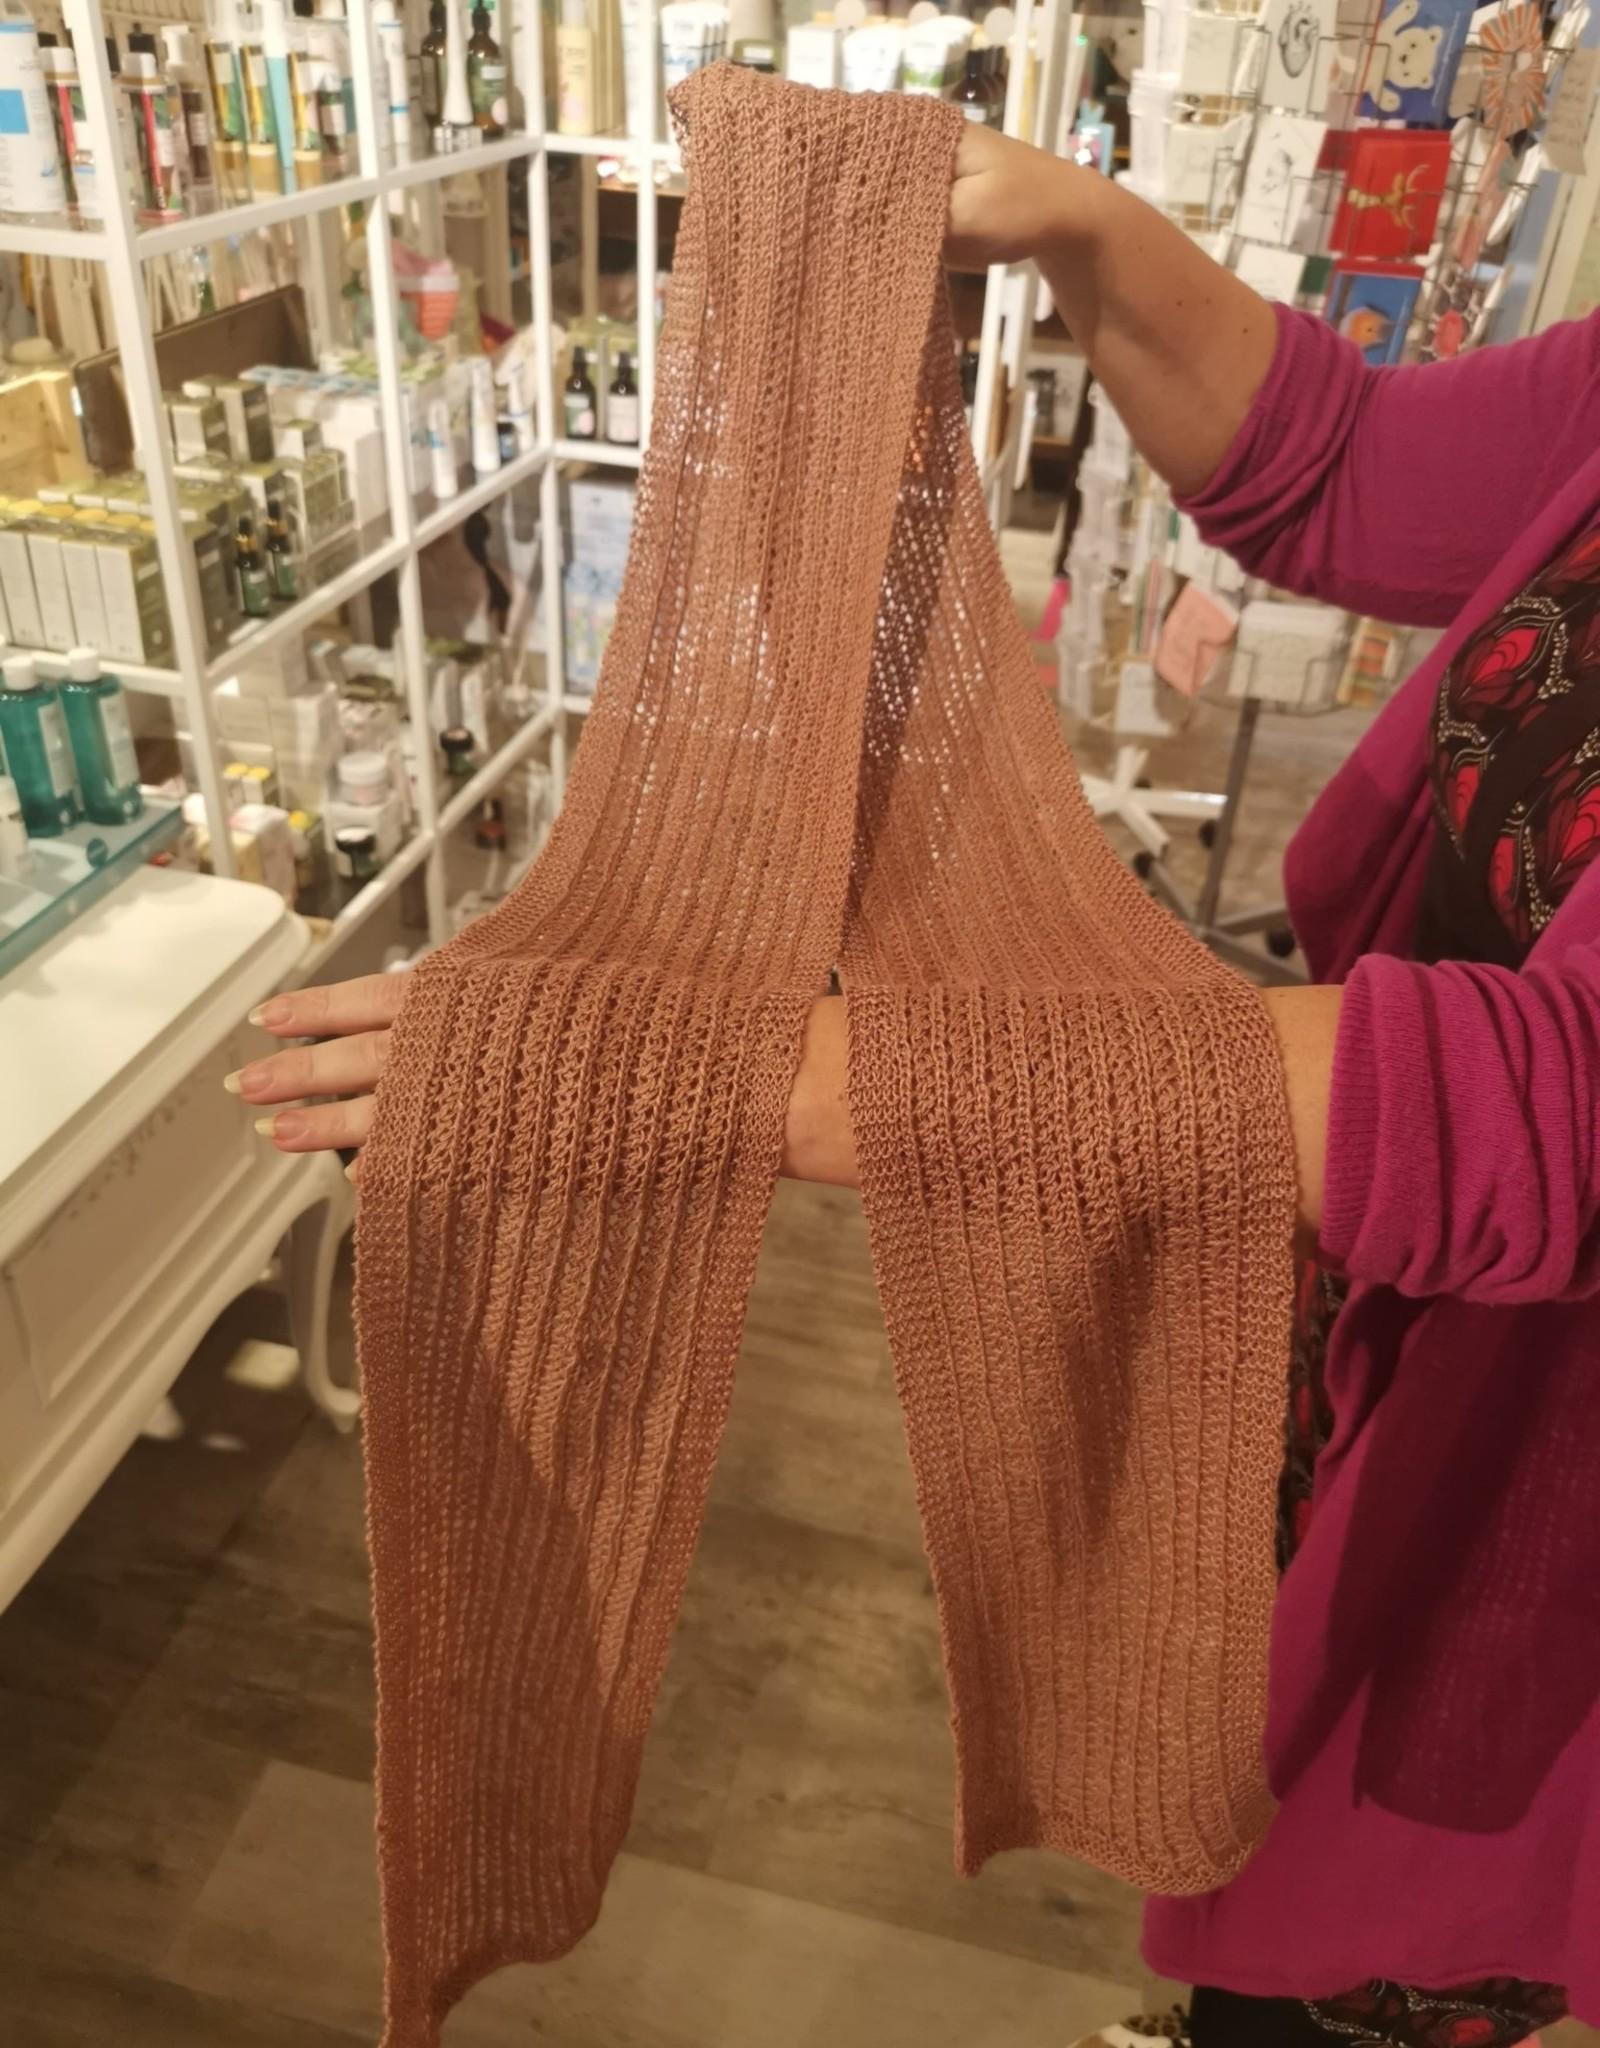 Roos met Witte Stippen Homemade sjaal 100% hennep oud roze